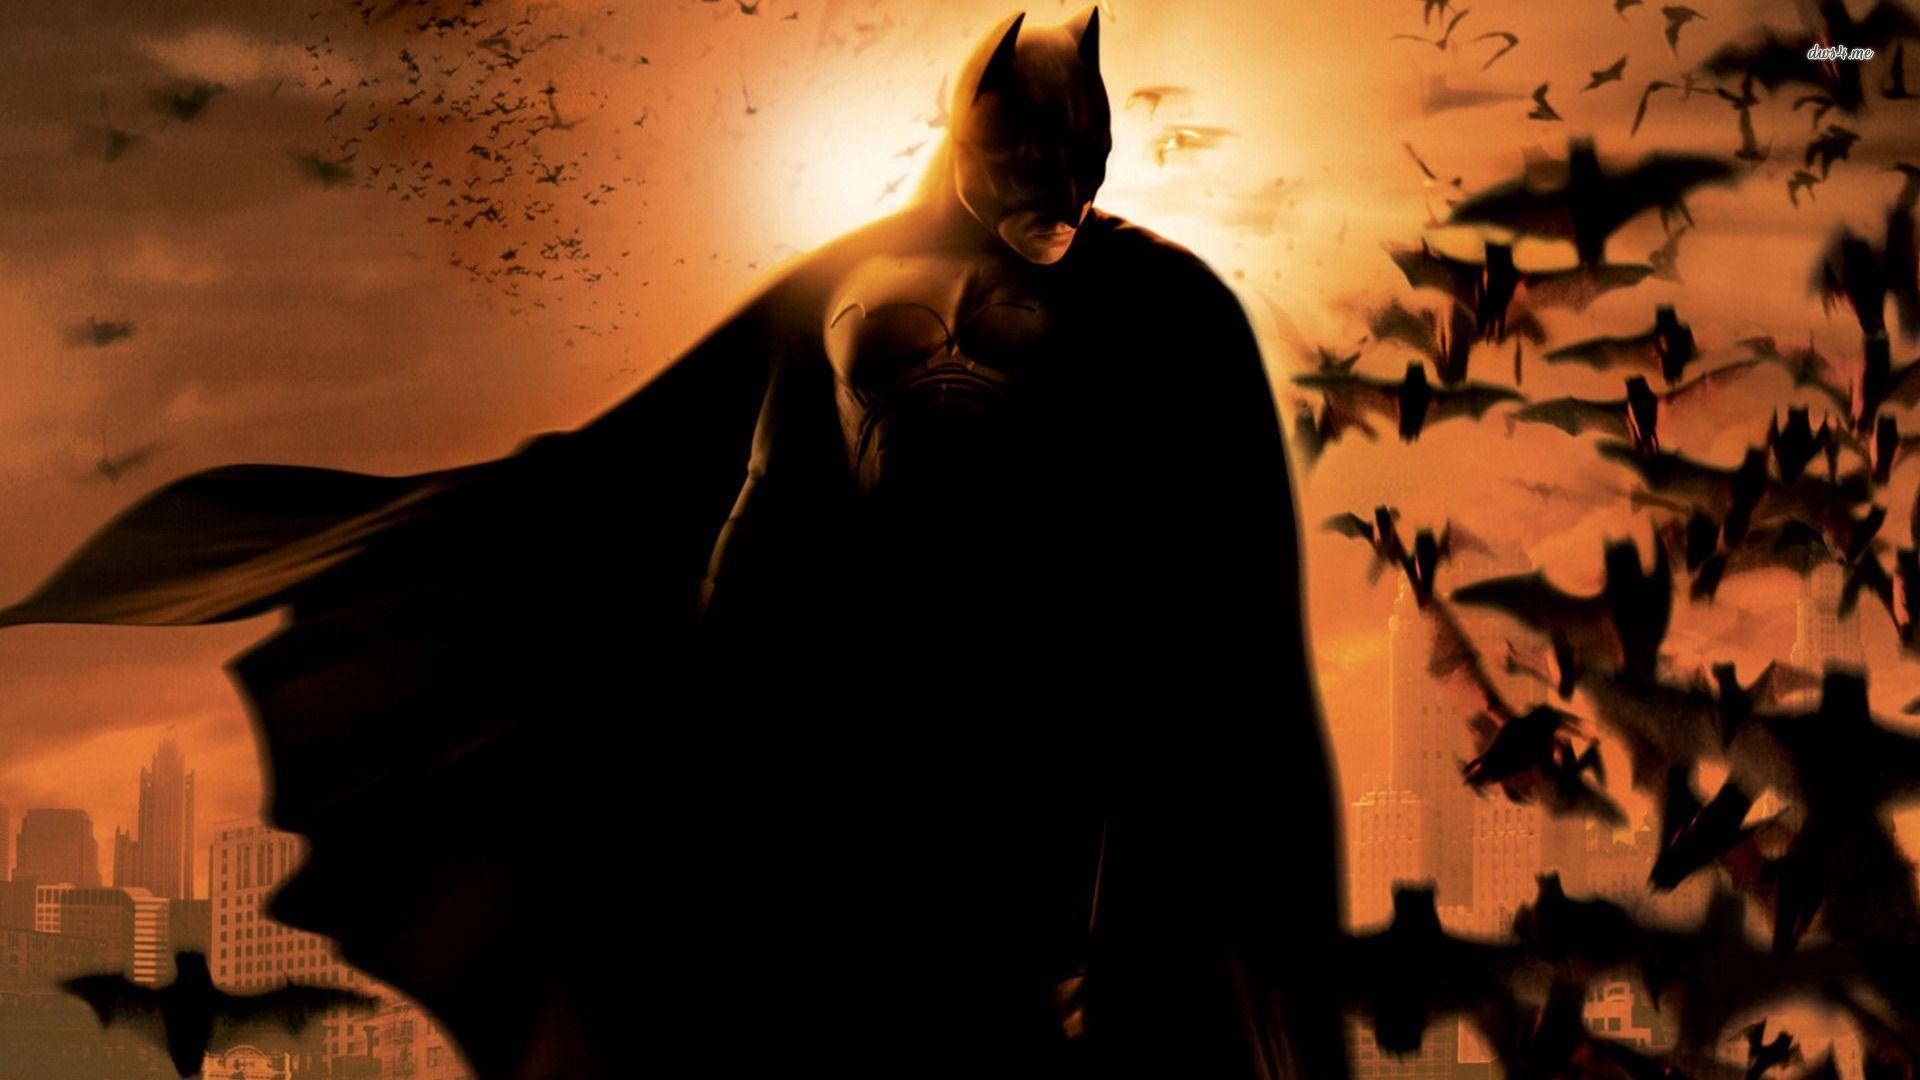 Batman wallpaper   Movie wallpapers   6103 1920x1080